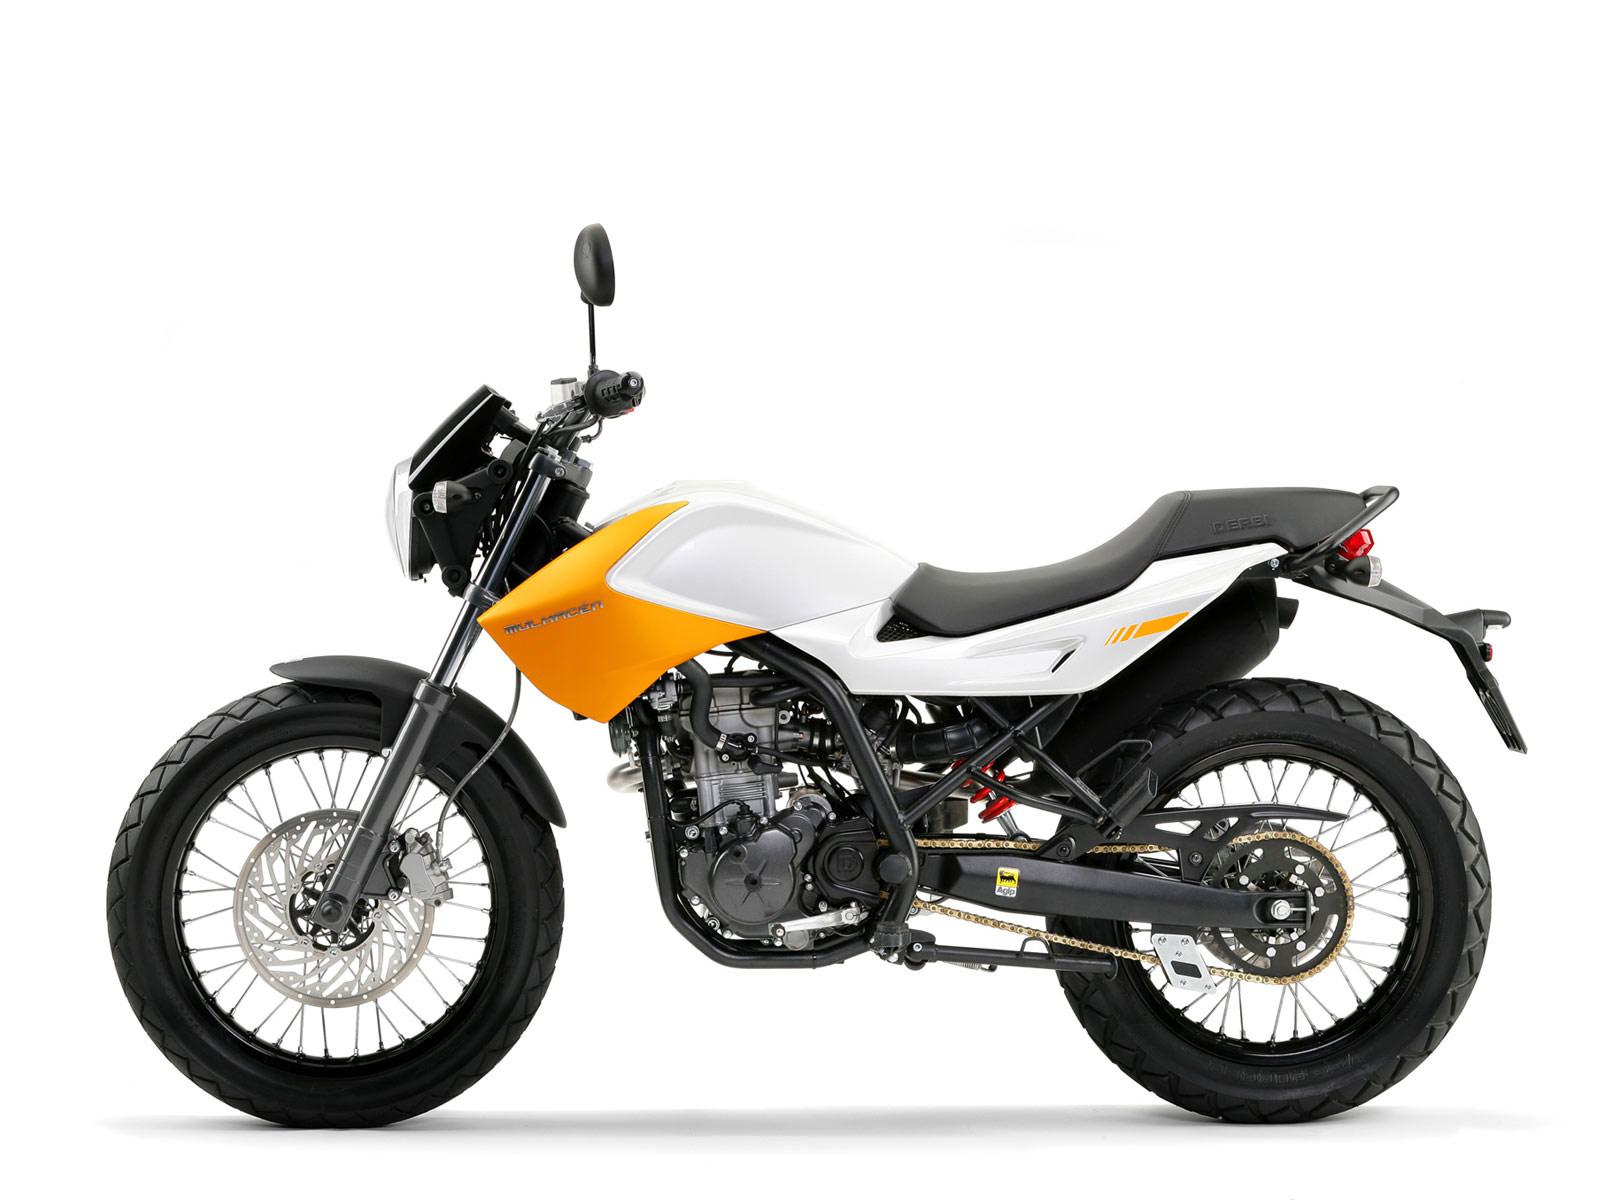 2008 derbi mulhacen 125 motorcycle insurance informations. Black Bedroom Furniture Sets. Home Design Ideas